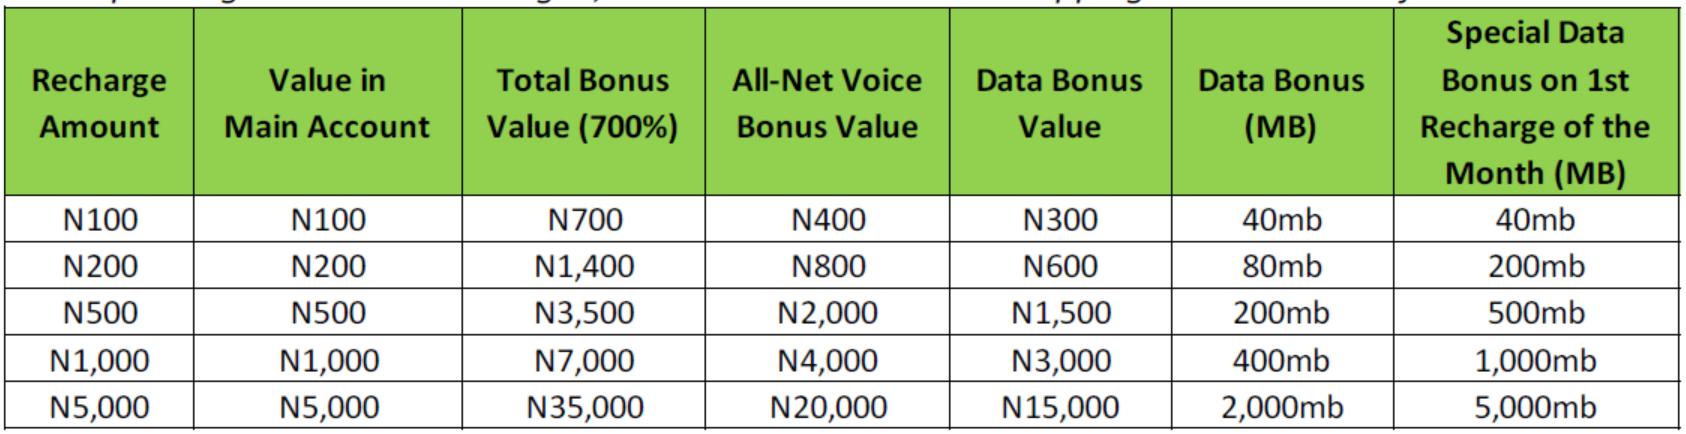 glo berekete bonus list per recharge denomination